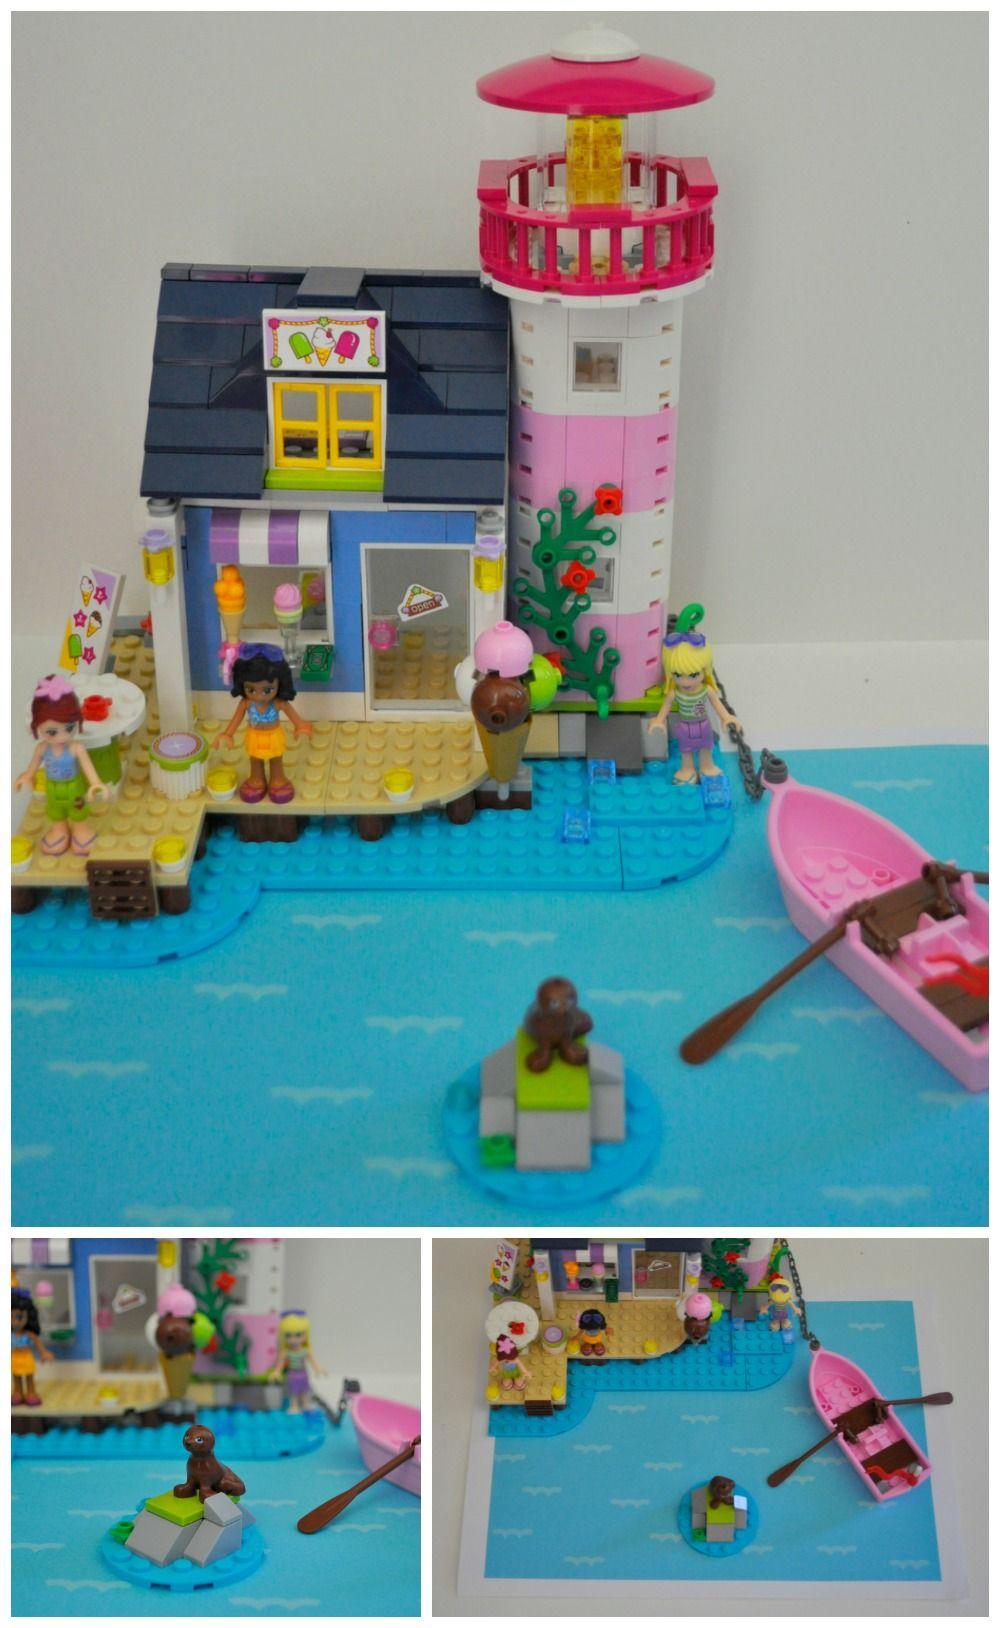 Lego Friends Heartlake Lighthouse Pinterest 41060 Disney Princess Sleeping Beautyamp039s Royal Bedroom